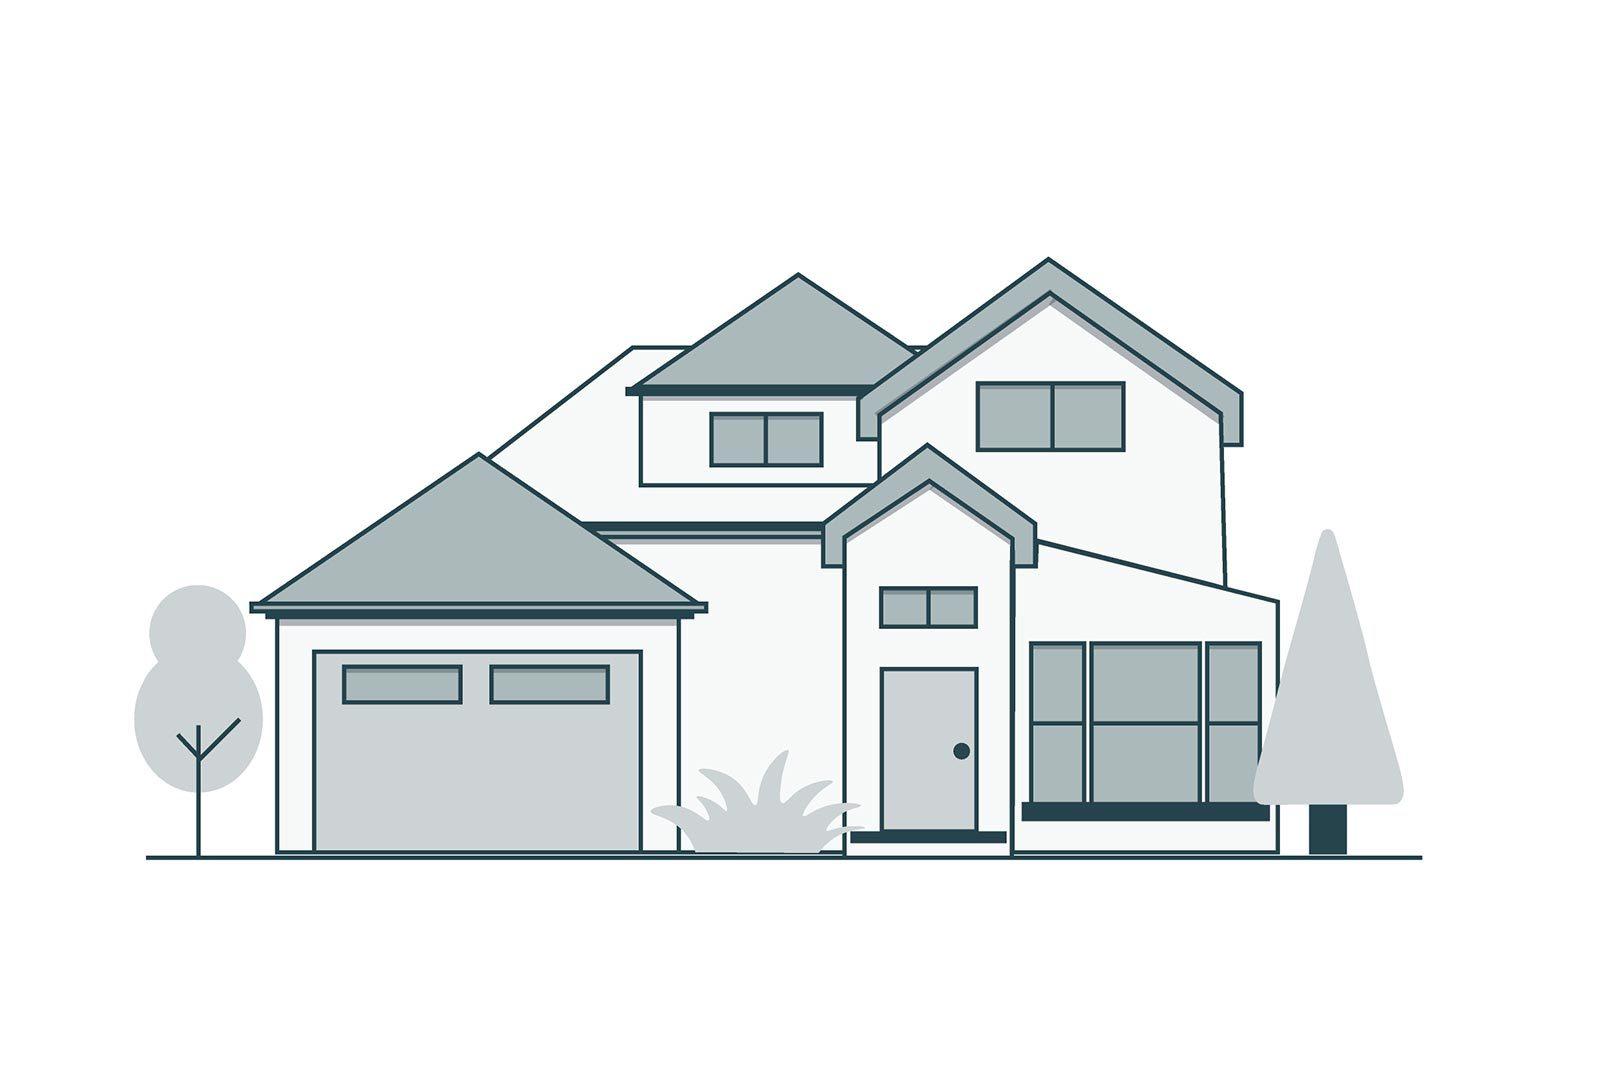 1471 19th Ave Apt 2 San Francisco, CA 94122